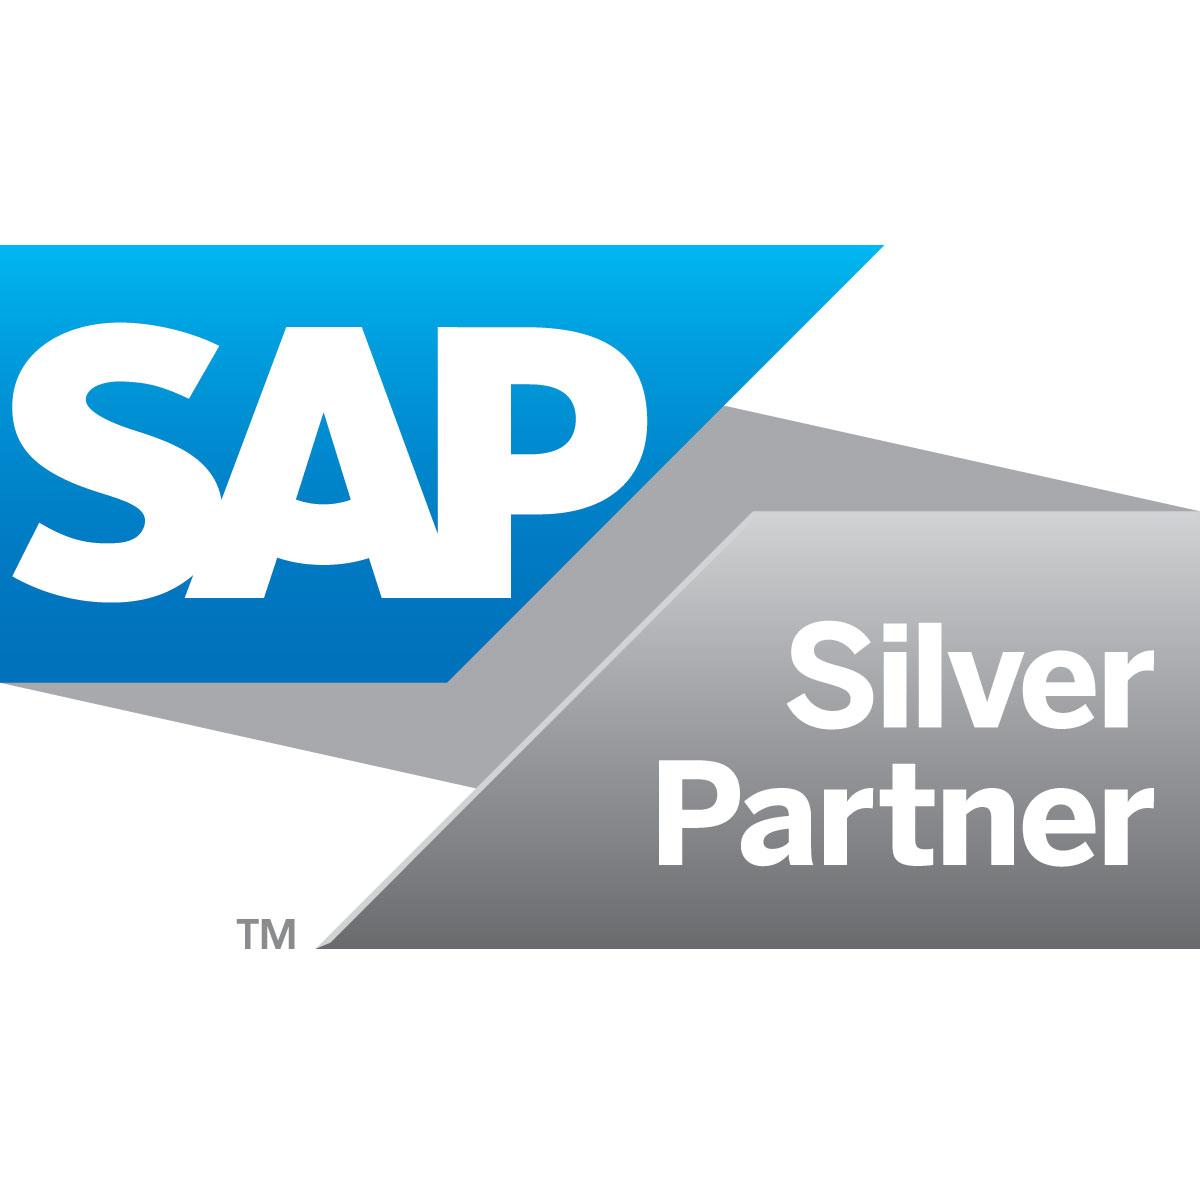 https://secureservercdn.net/198.71.233.185/sz0.269.myftpupload.com/wp-content/uploads/2020/06/SAP_Silver_Partner_C.jpg?time=1632342224